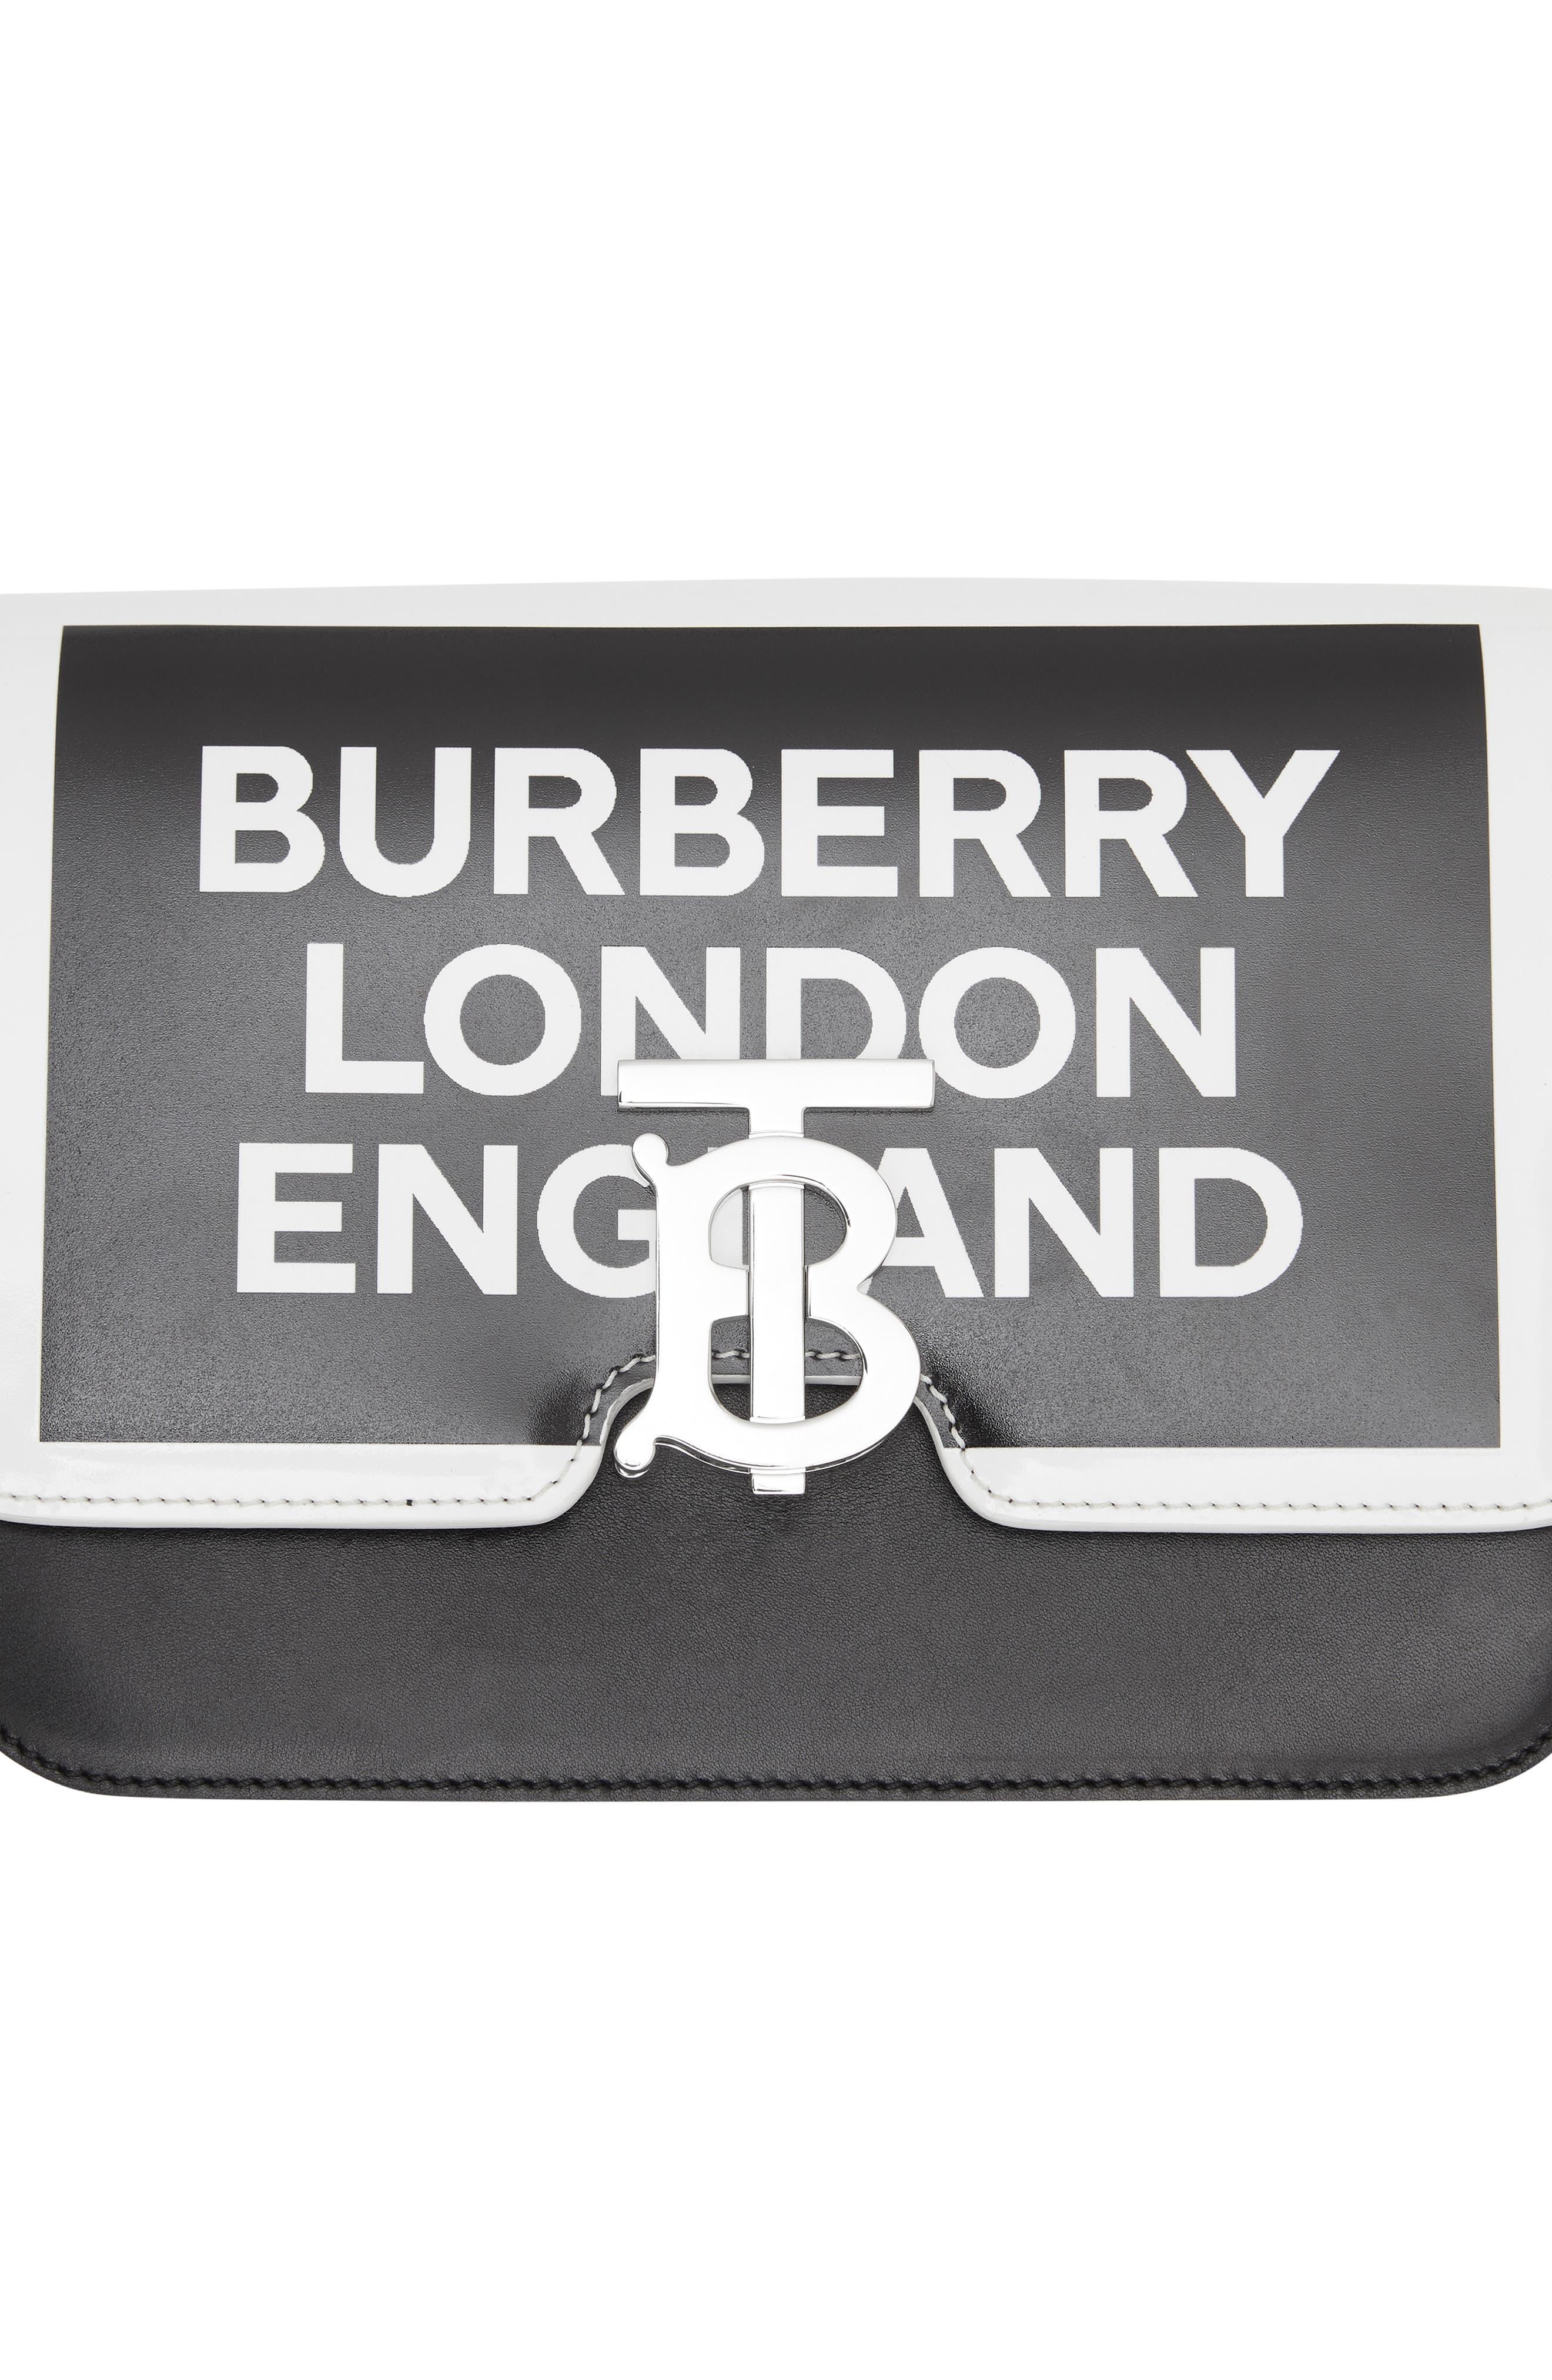 BURBERRY,                             Small Painted Edge Logo TB Crossbody Bag,                             Alternate thumbnail 7, color,                             BLACK/ WHITE